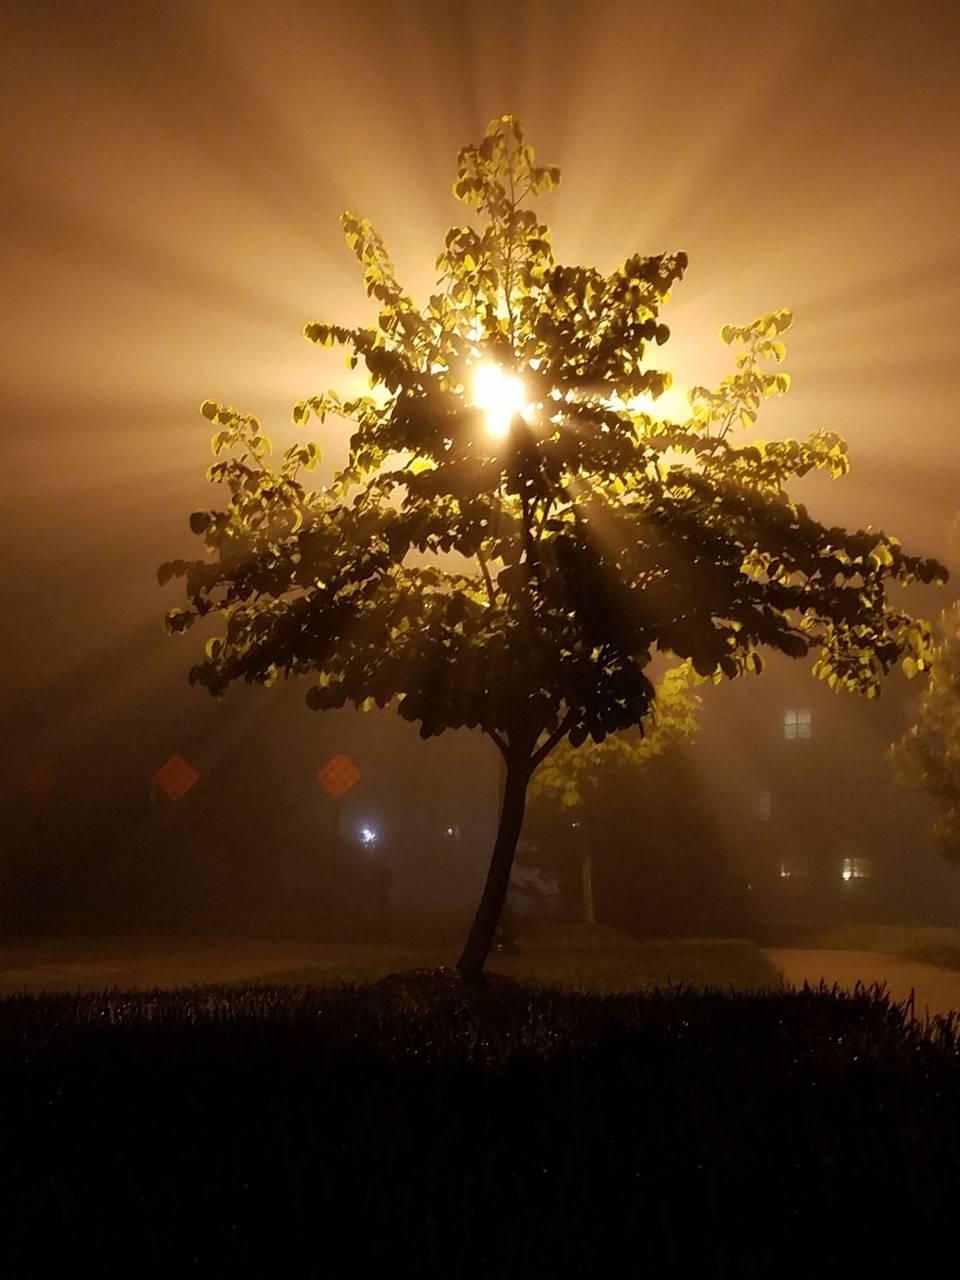 Foggy Silhouette